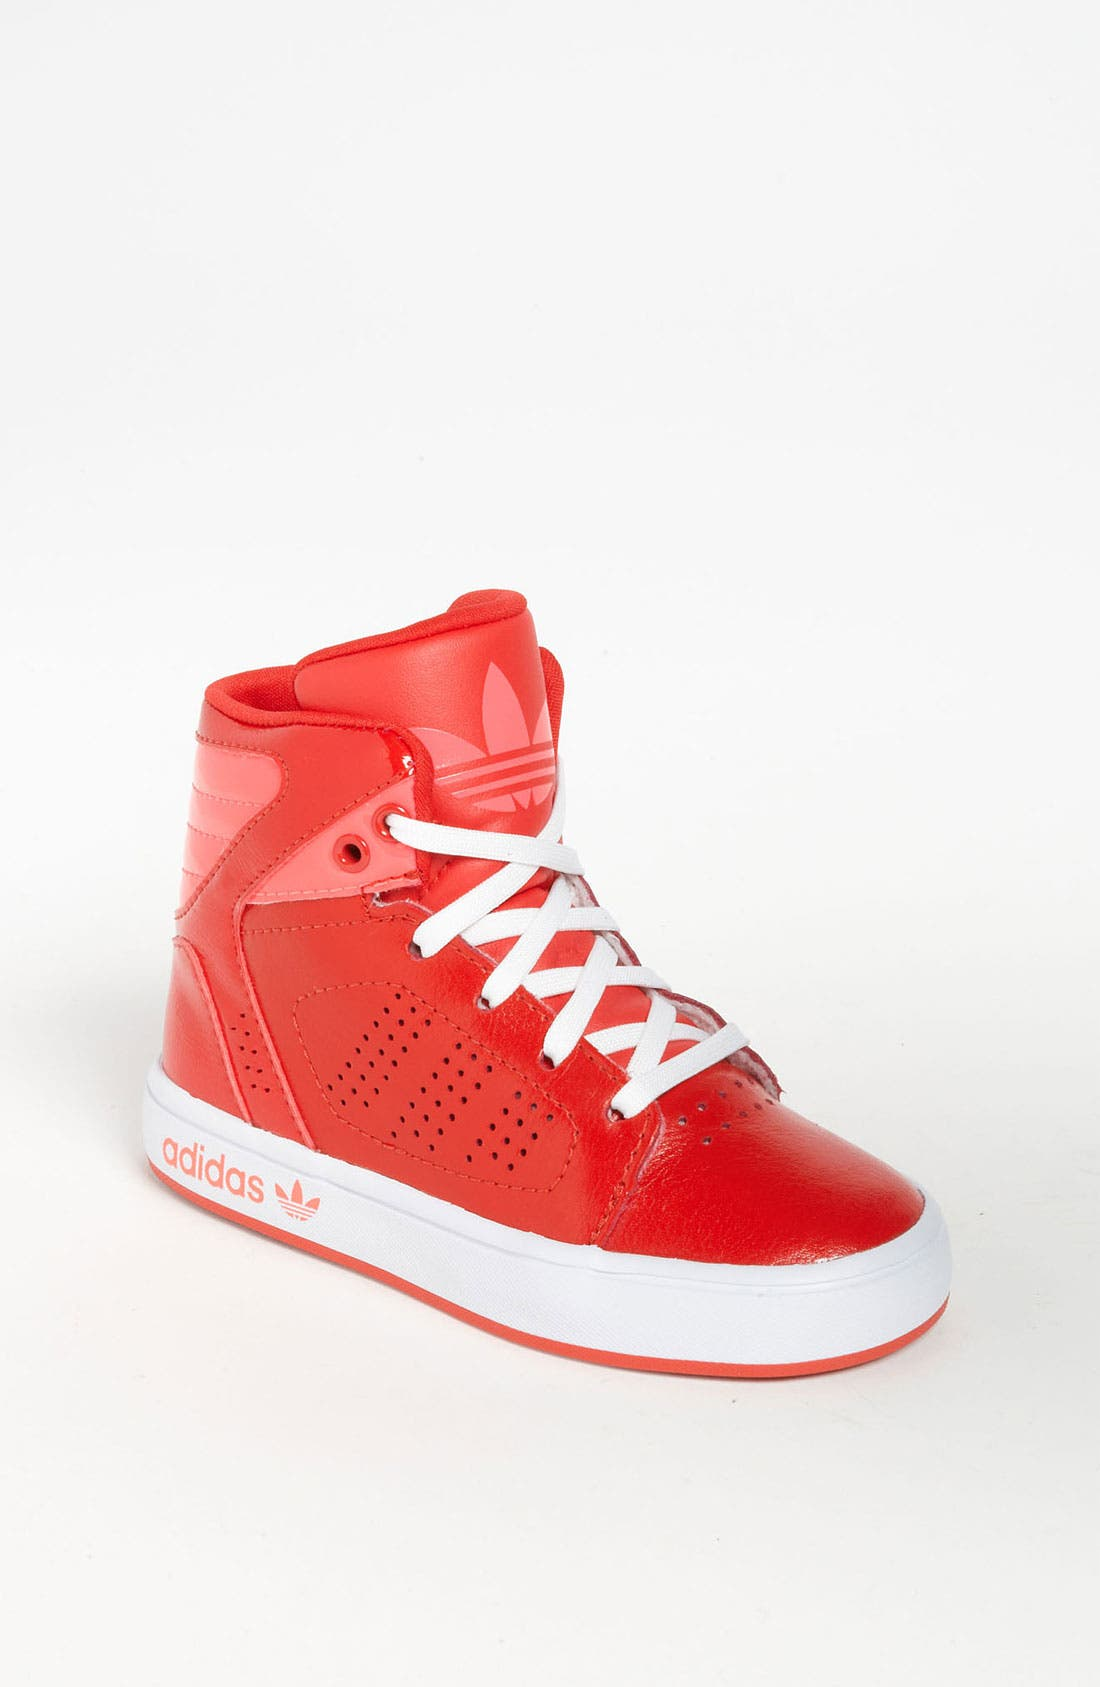 Alternate Image 1 Selected - adidas 'Adi-High Ext' High Top Sneaker (Baby, Walker & Toddler)